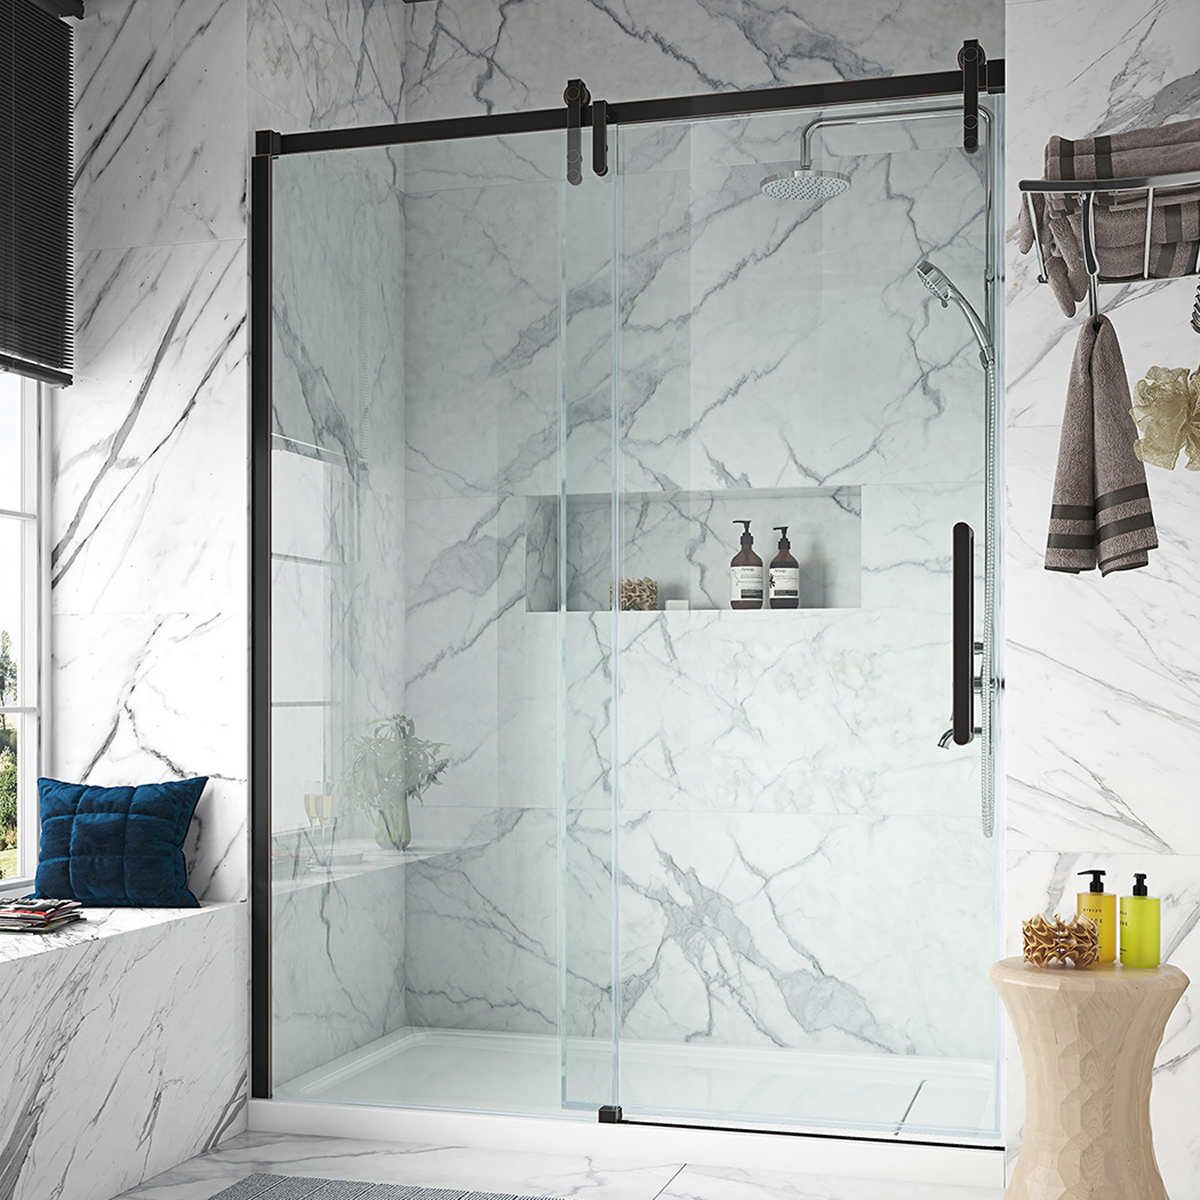 Ove Sheffield 60 Tempered Glass Shower Door In 2020 Shower Doors Glass Shower Doors Glass Shower